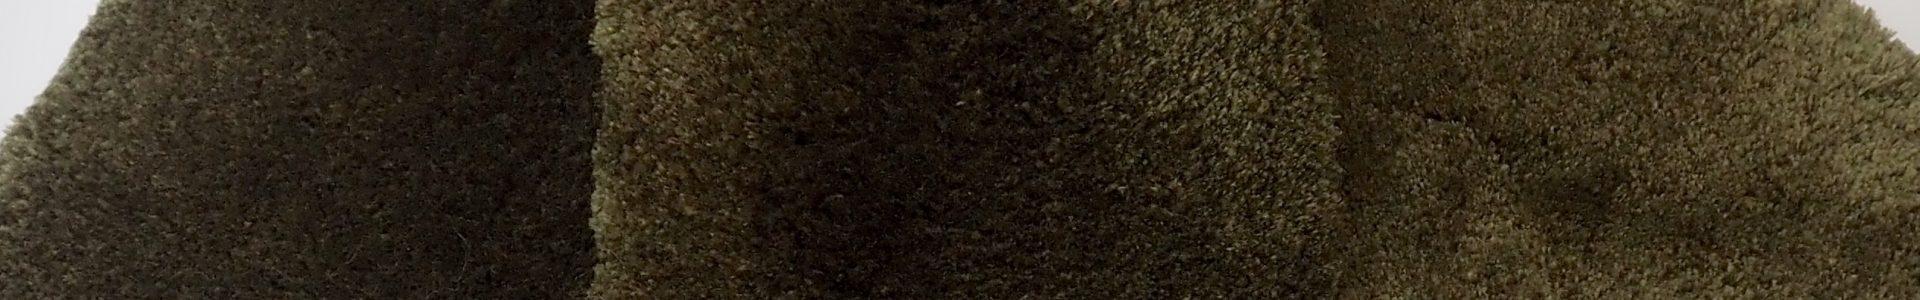 Olive Branch (sample)